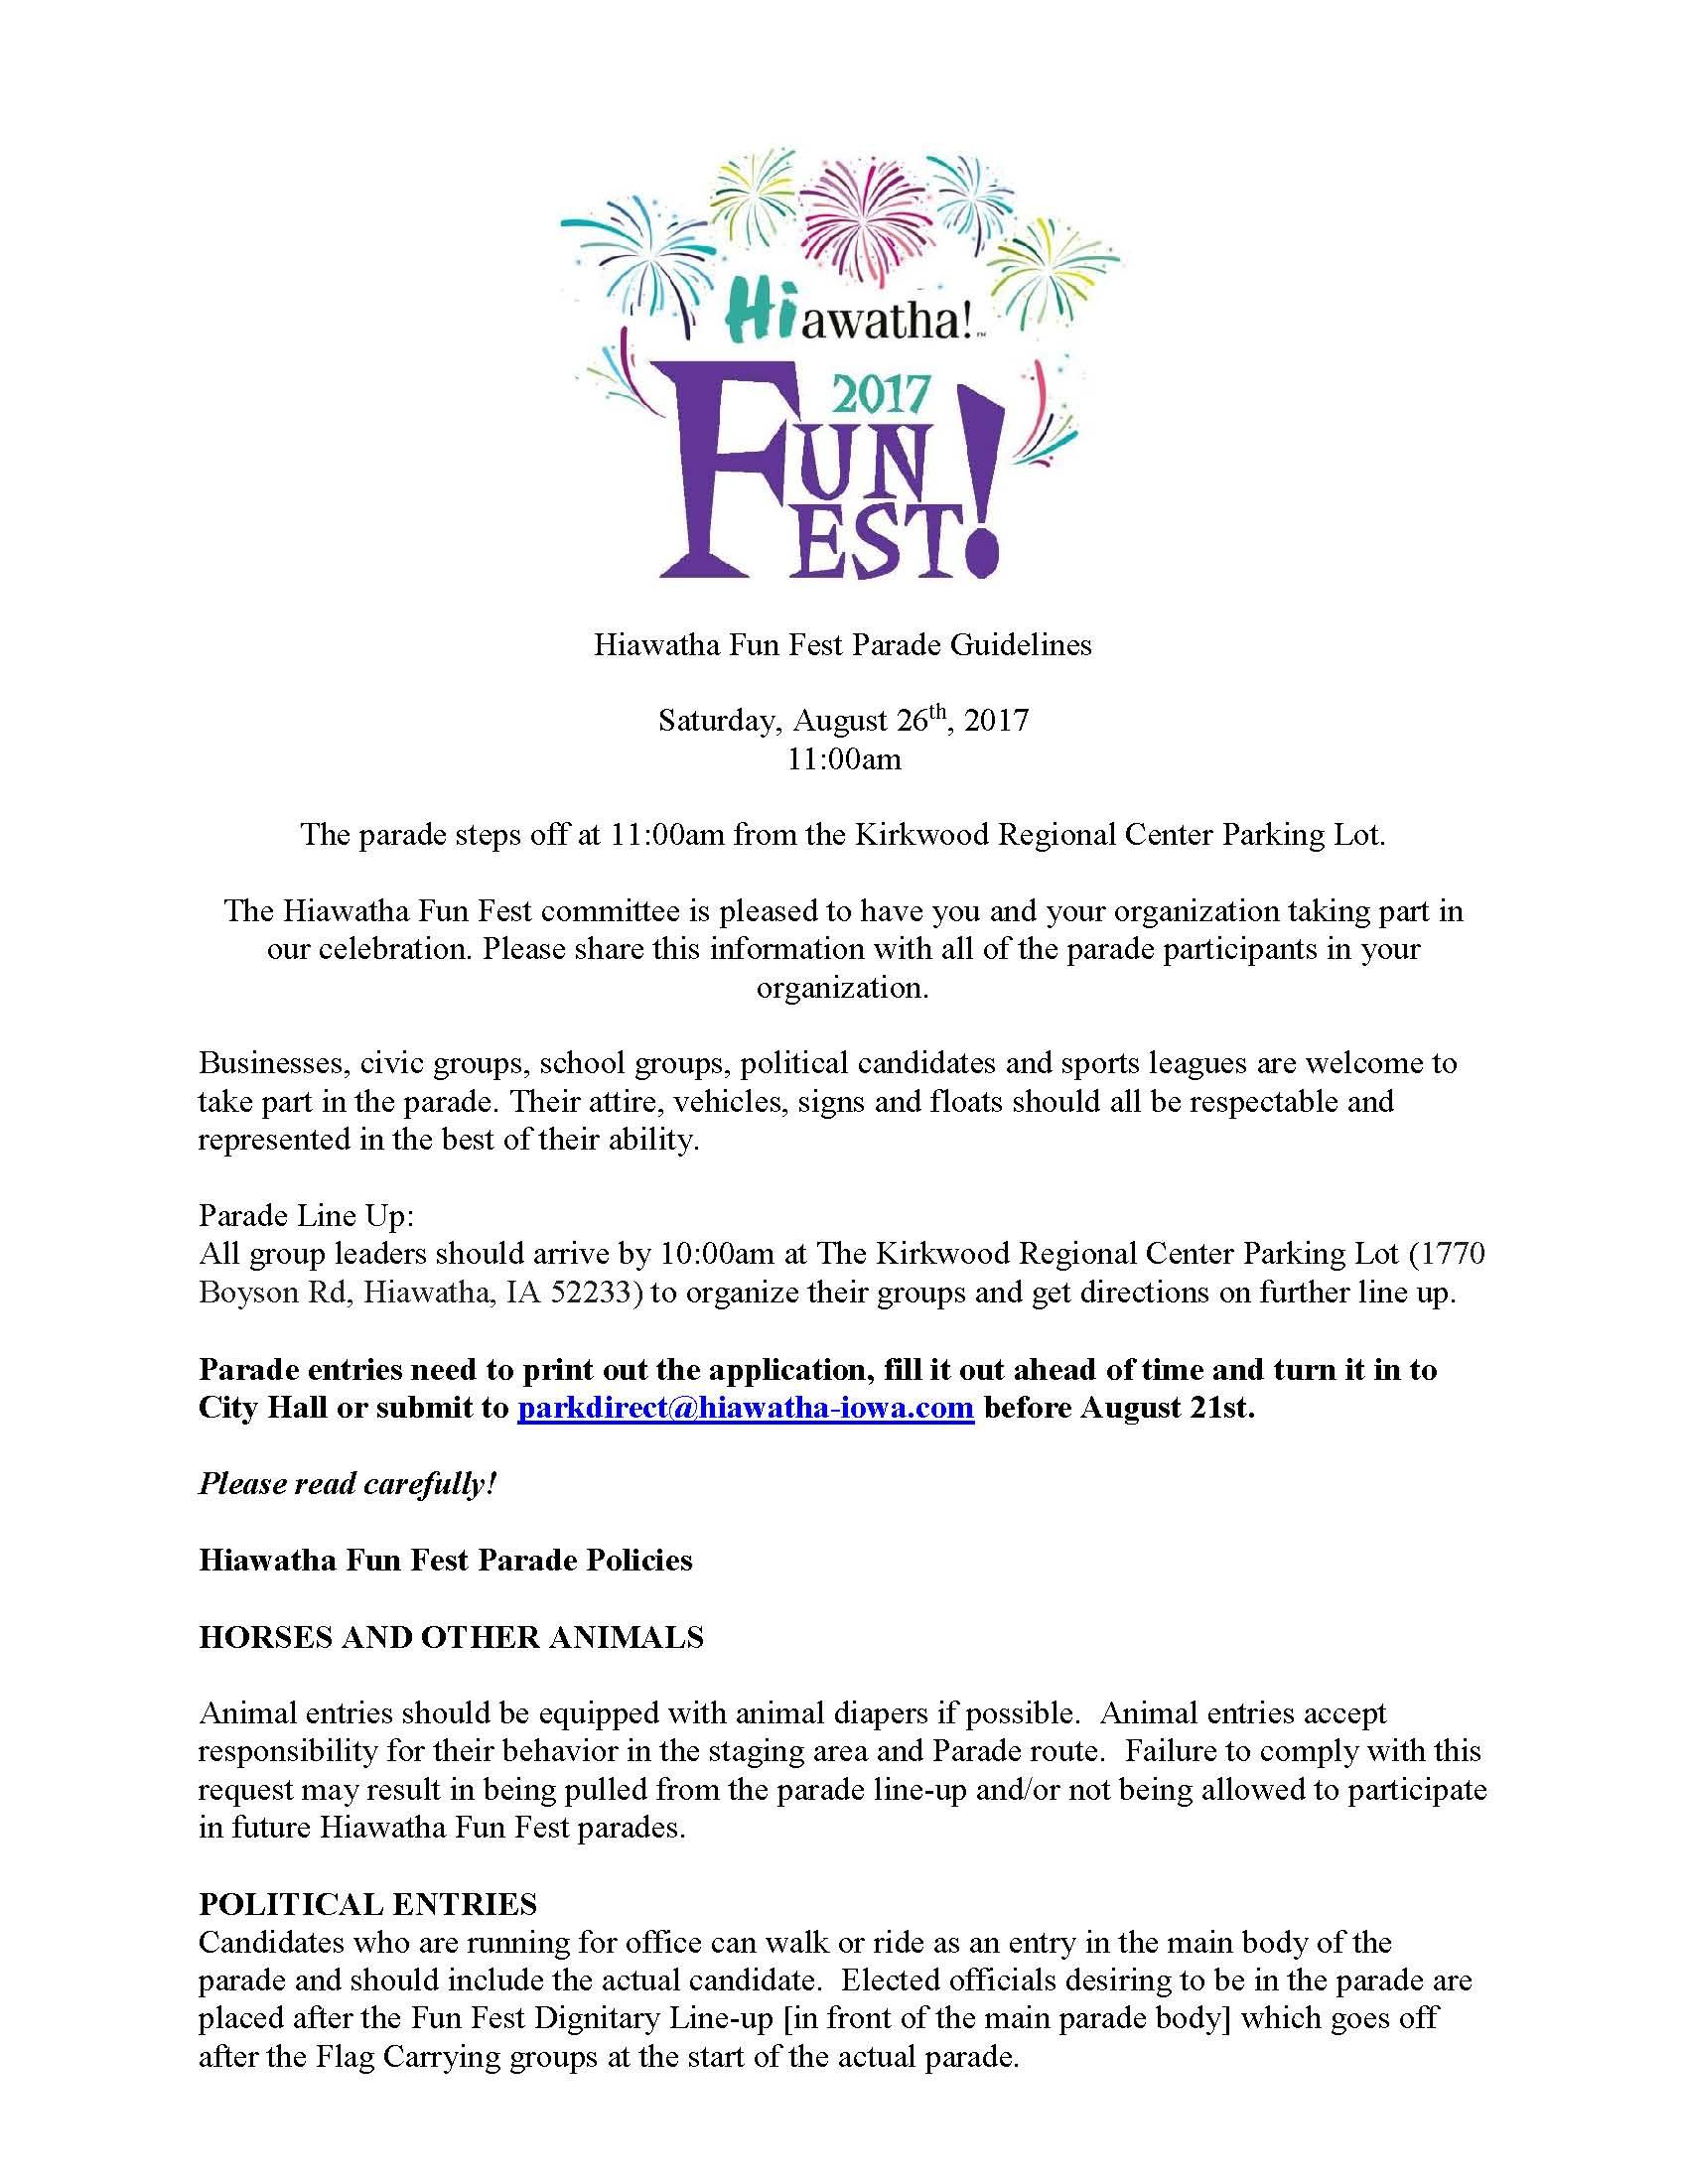 Hiawatha Fun Fest Parade Guidelines_Page_1